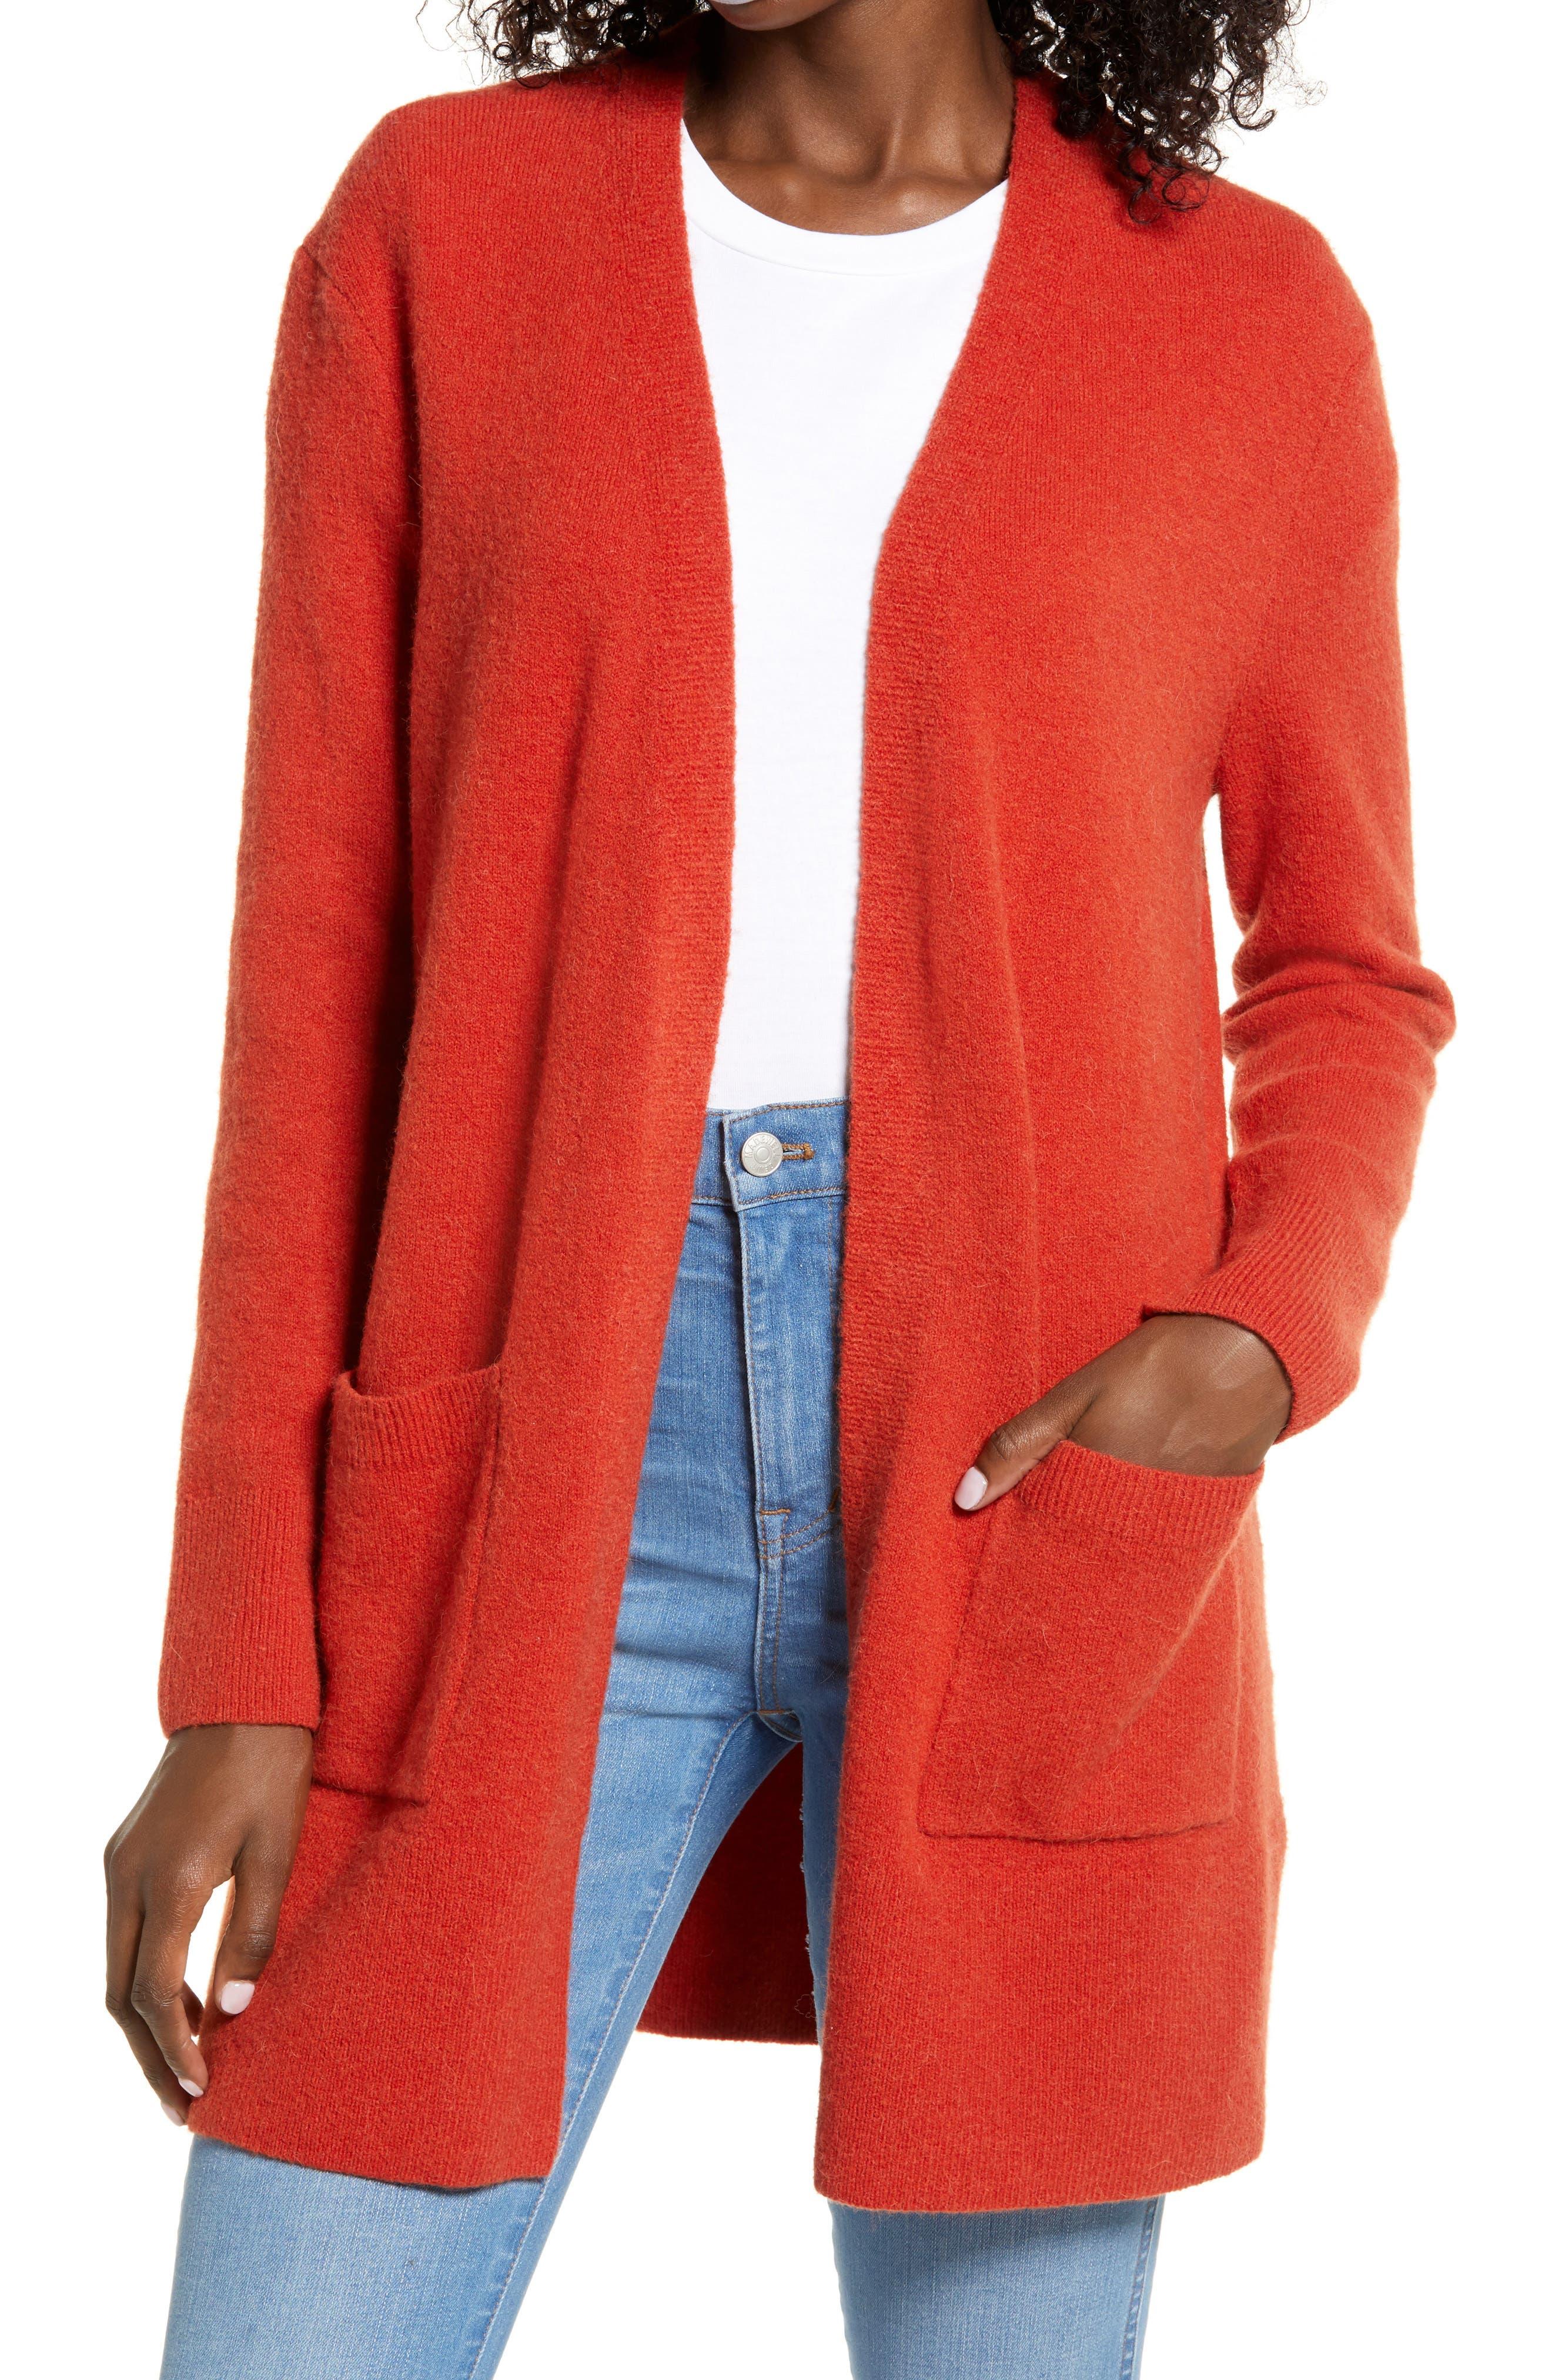 Image of Madewell Kent Cardigan Sweater